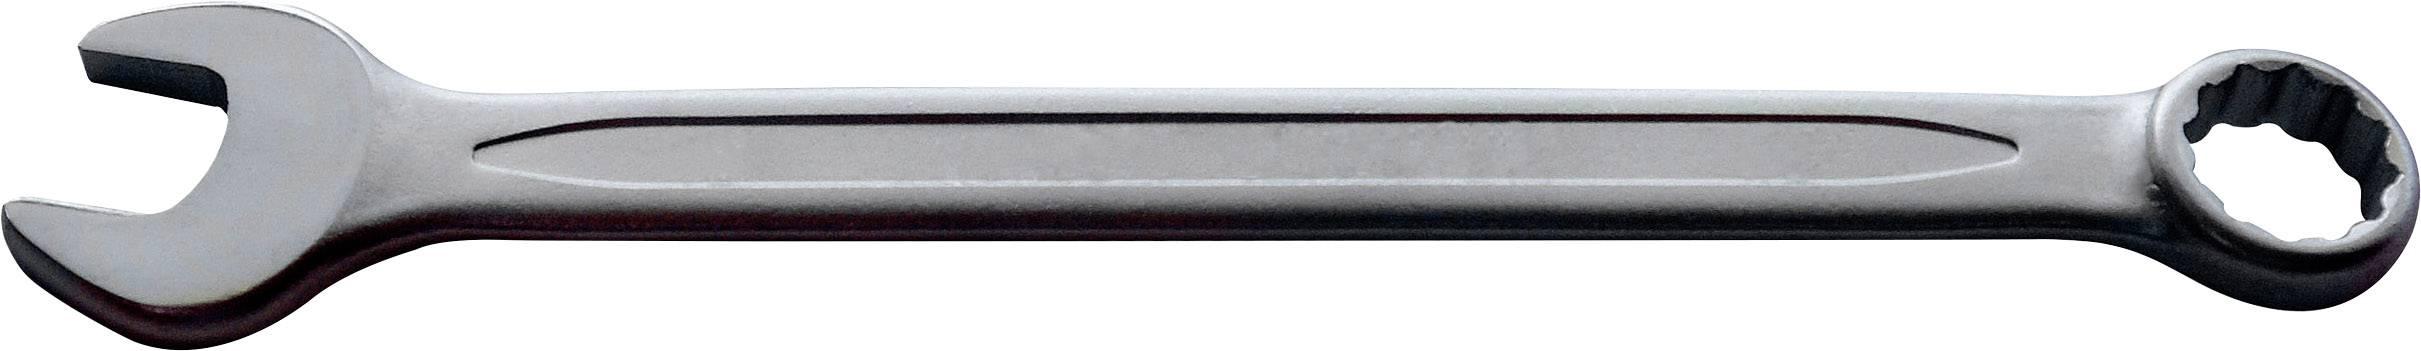 Očkoplochý klíč TOOLCRAFT 820833, N/A, 9 mm